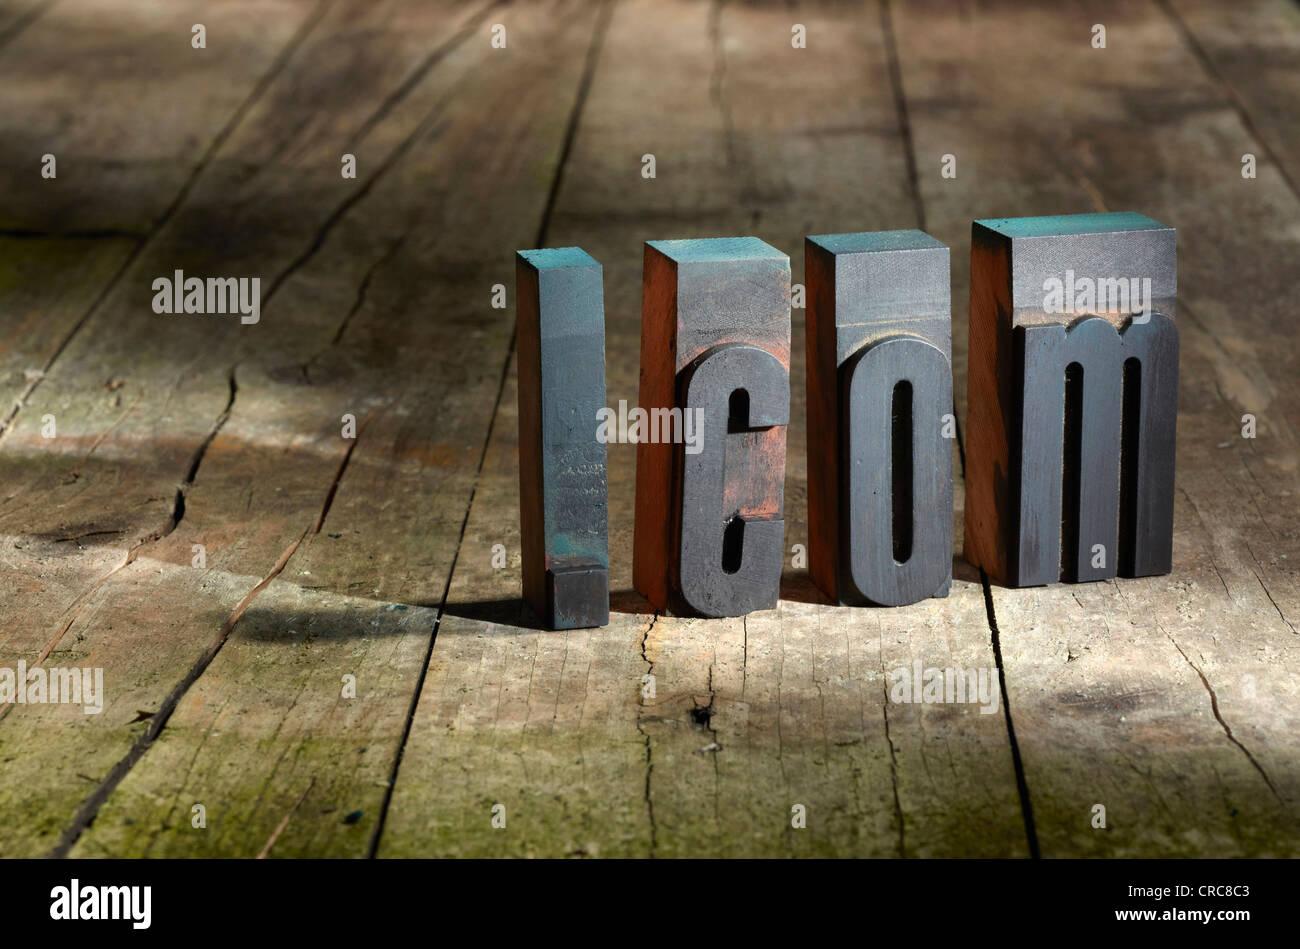 Wooden blocks spelling .com - Stock Image